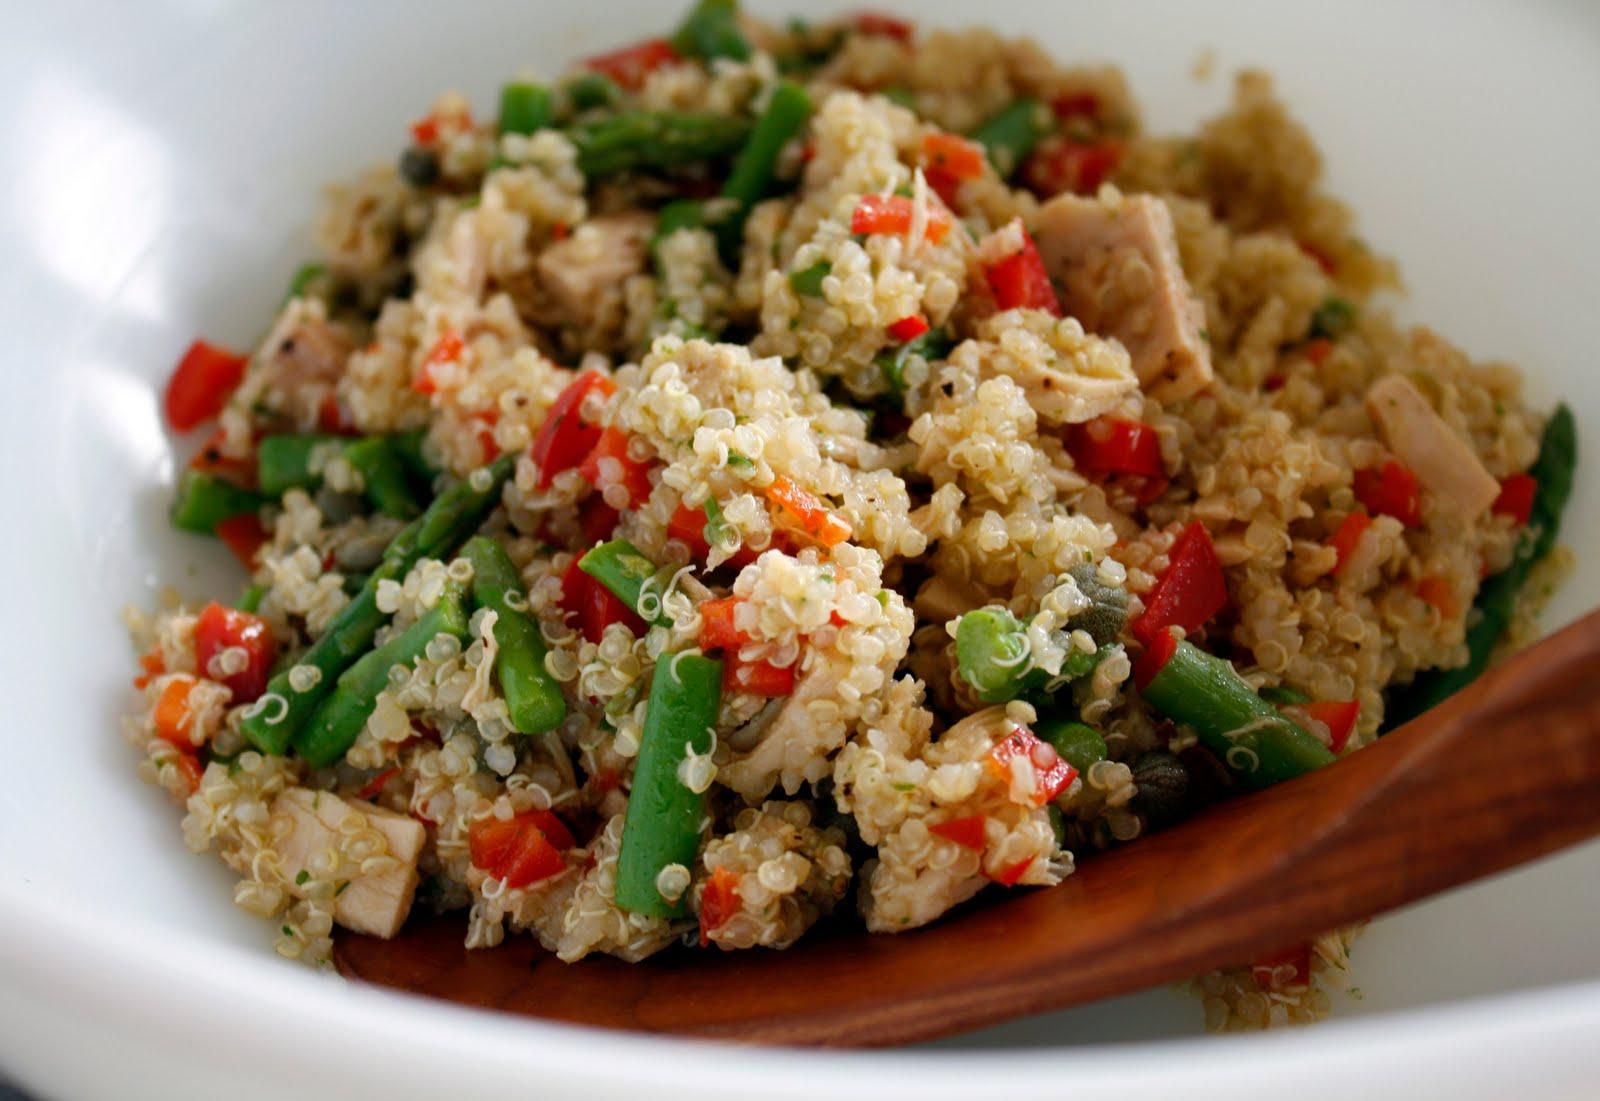 Healthy and delicious Quinoa recipes